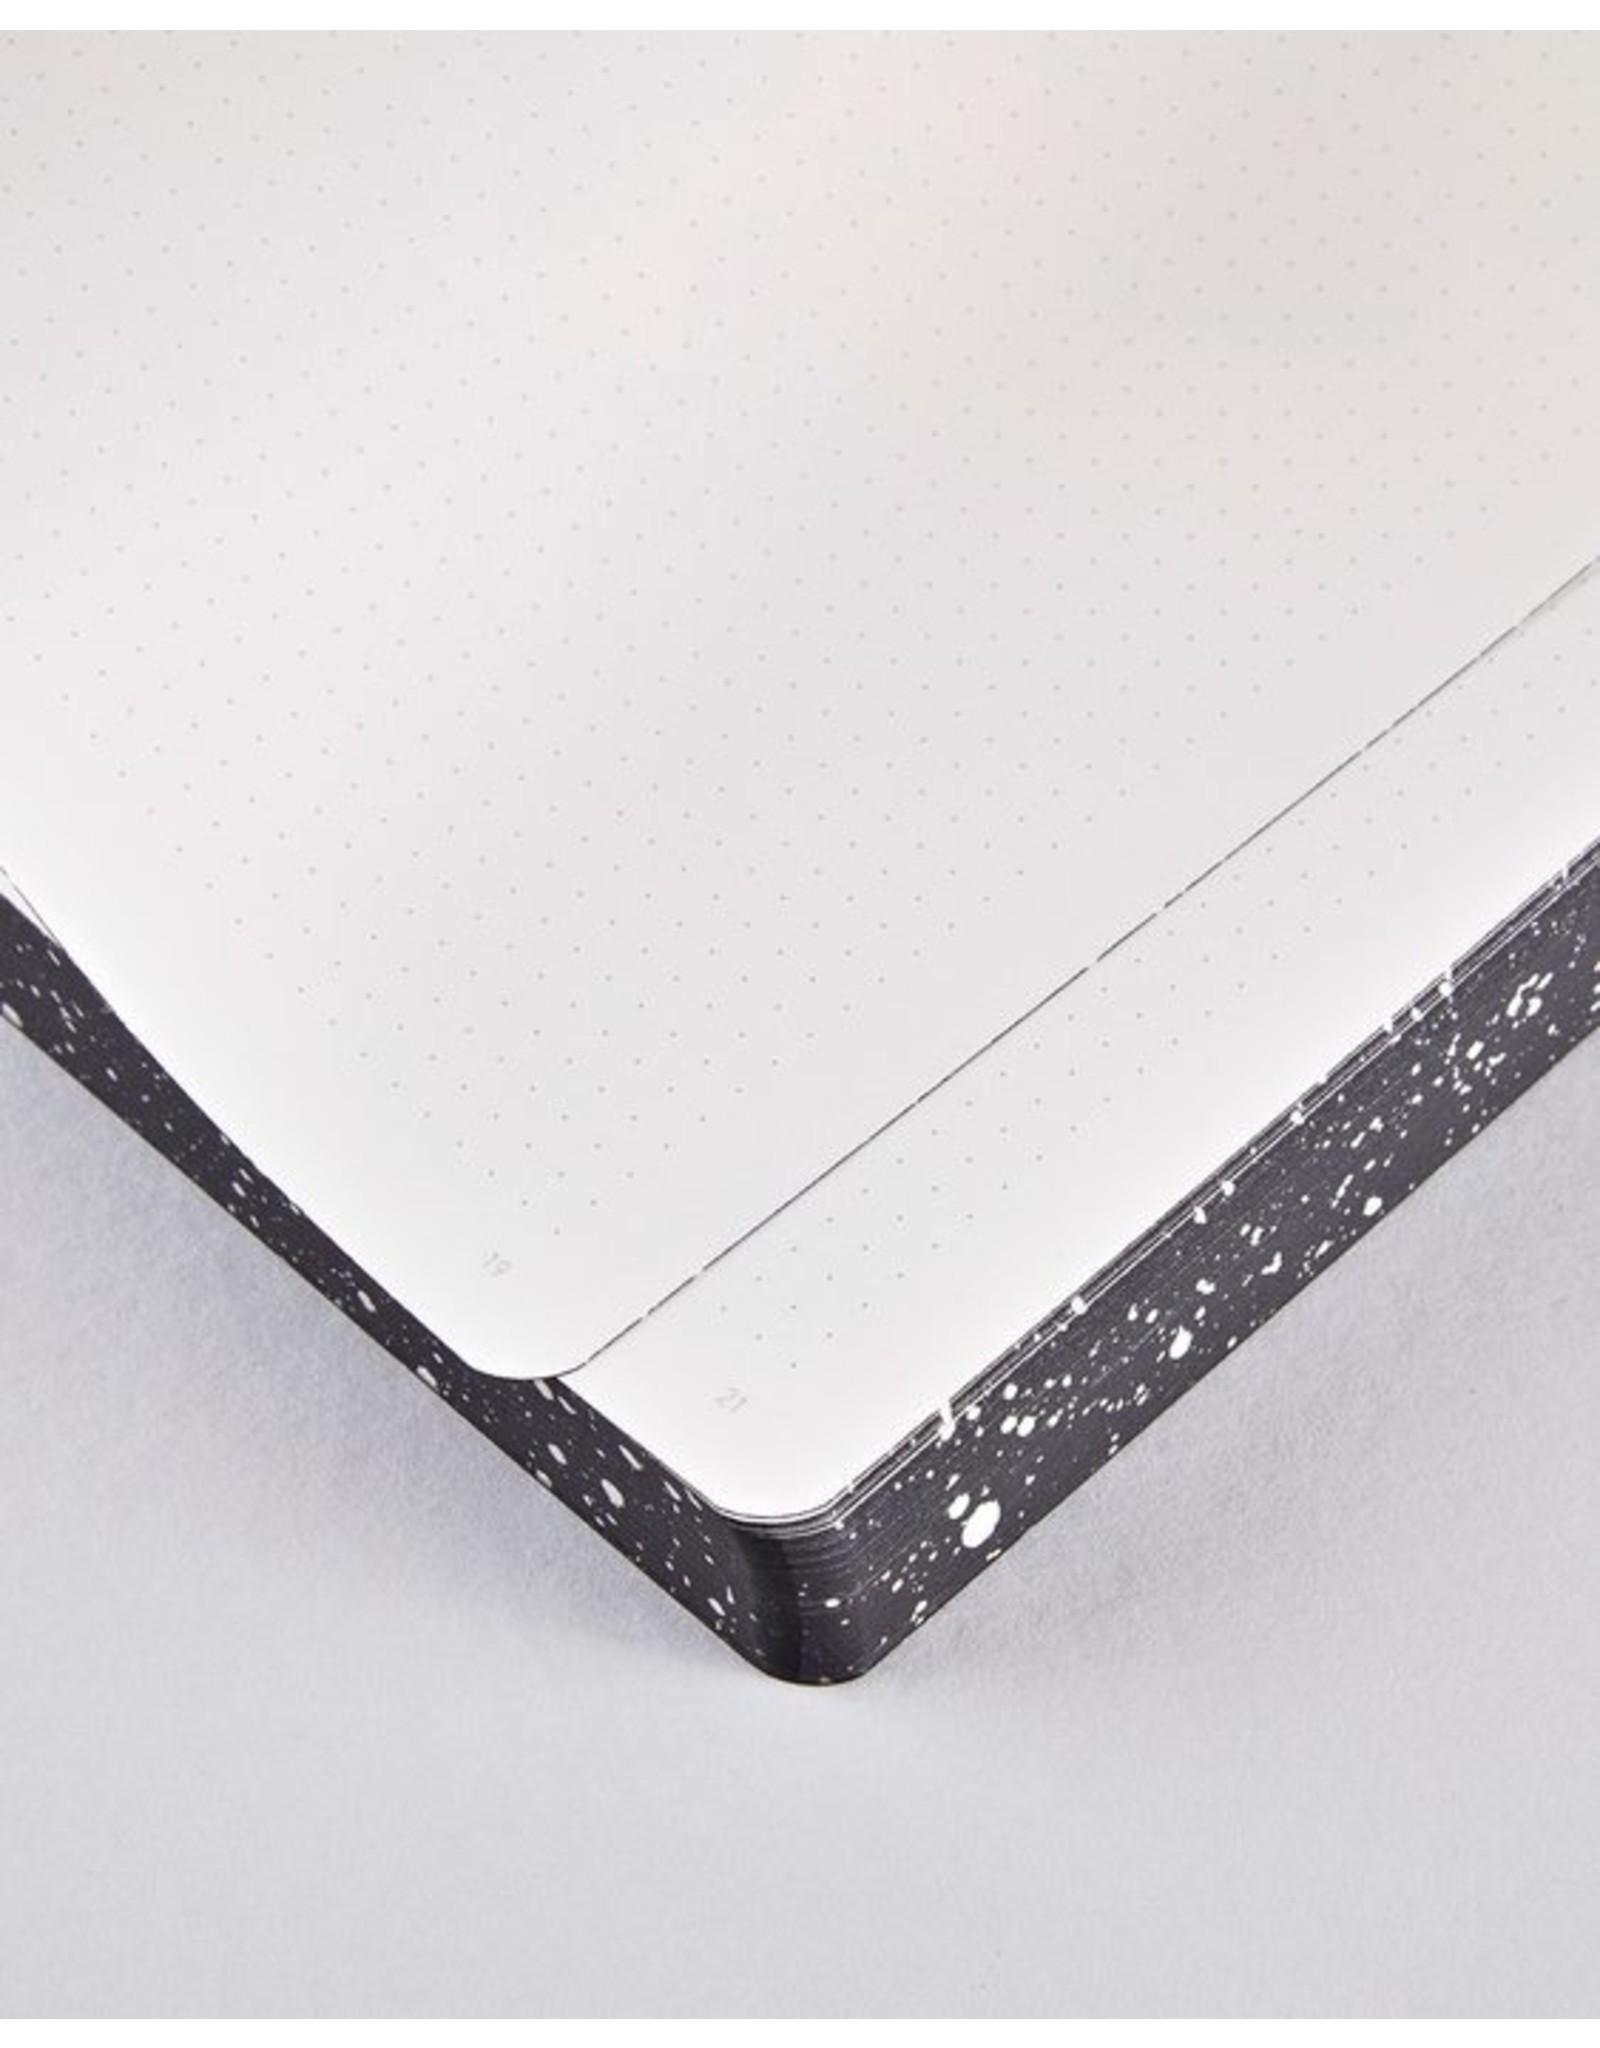 Nuuna Notebook Graphic L Milky way